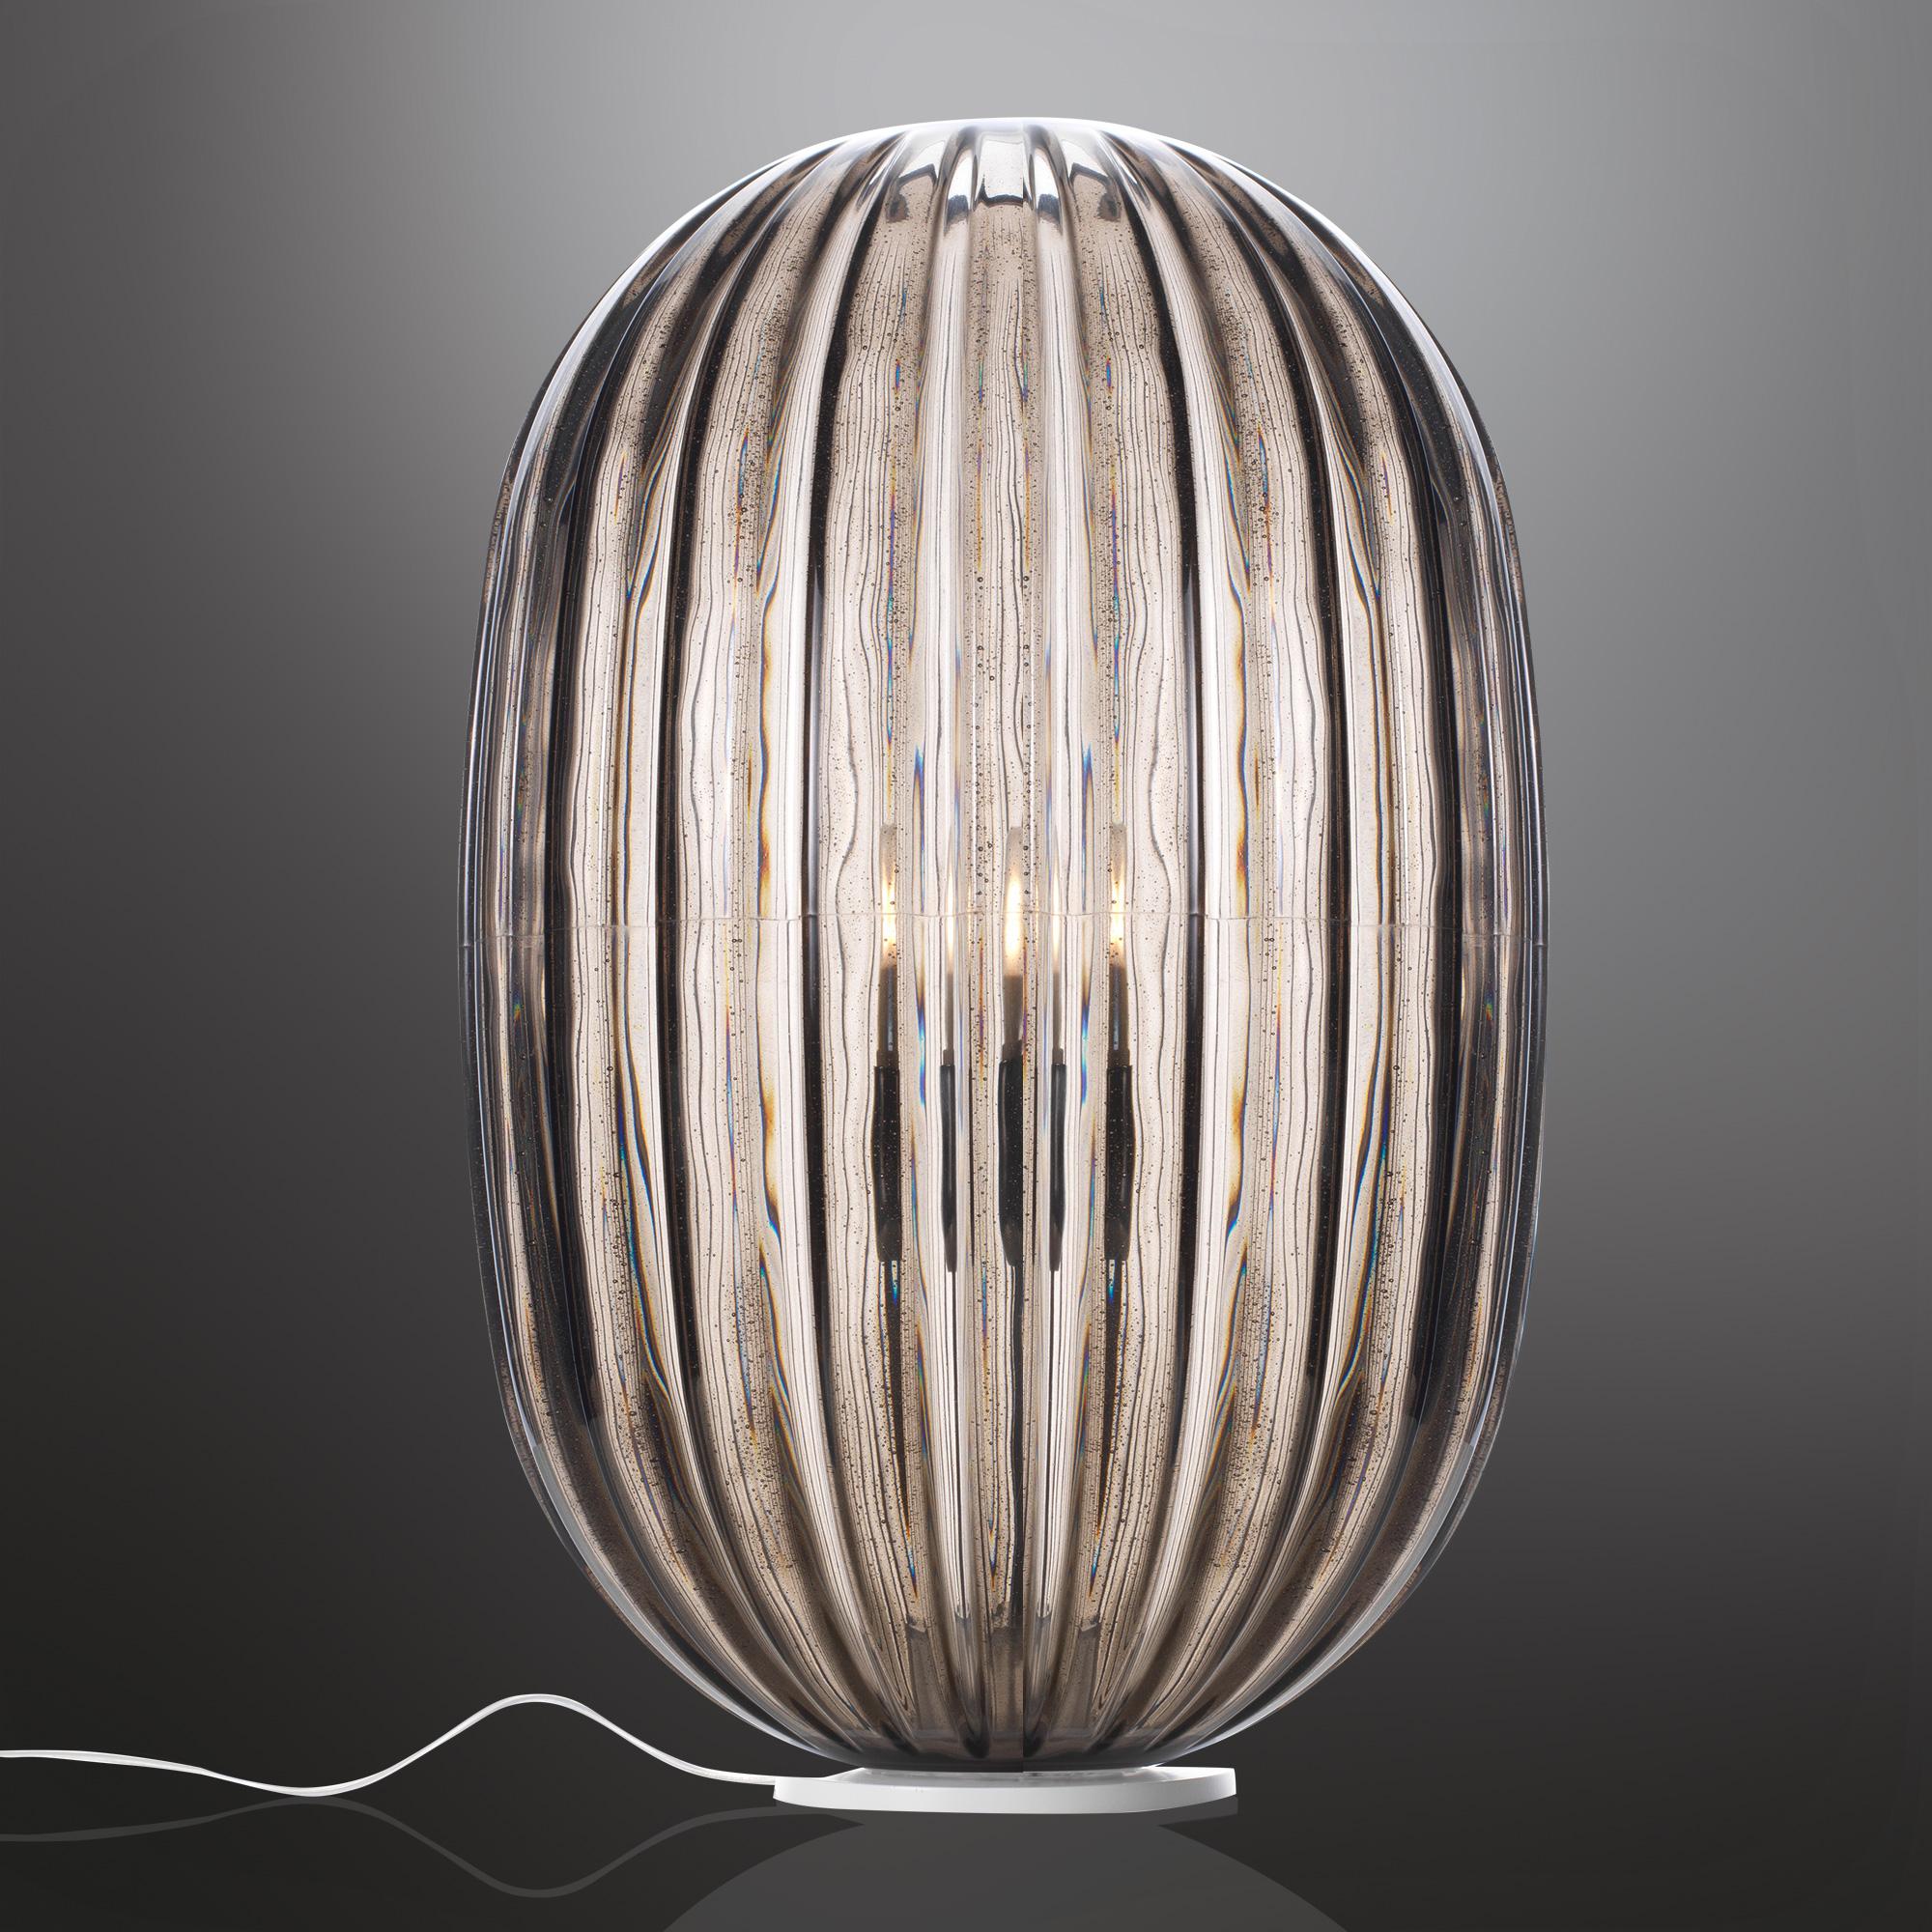 foscarini plass media tavolo tischleuchte mit dimmer 2240012d25 reuter onlineshop. Black Bedroom Furniture Sets. Home Design Ideas